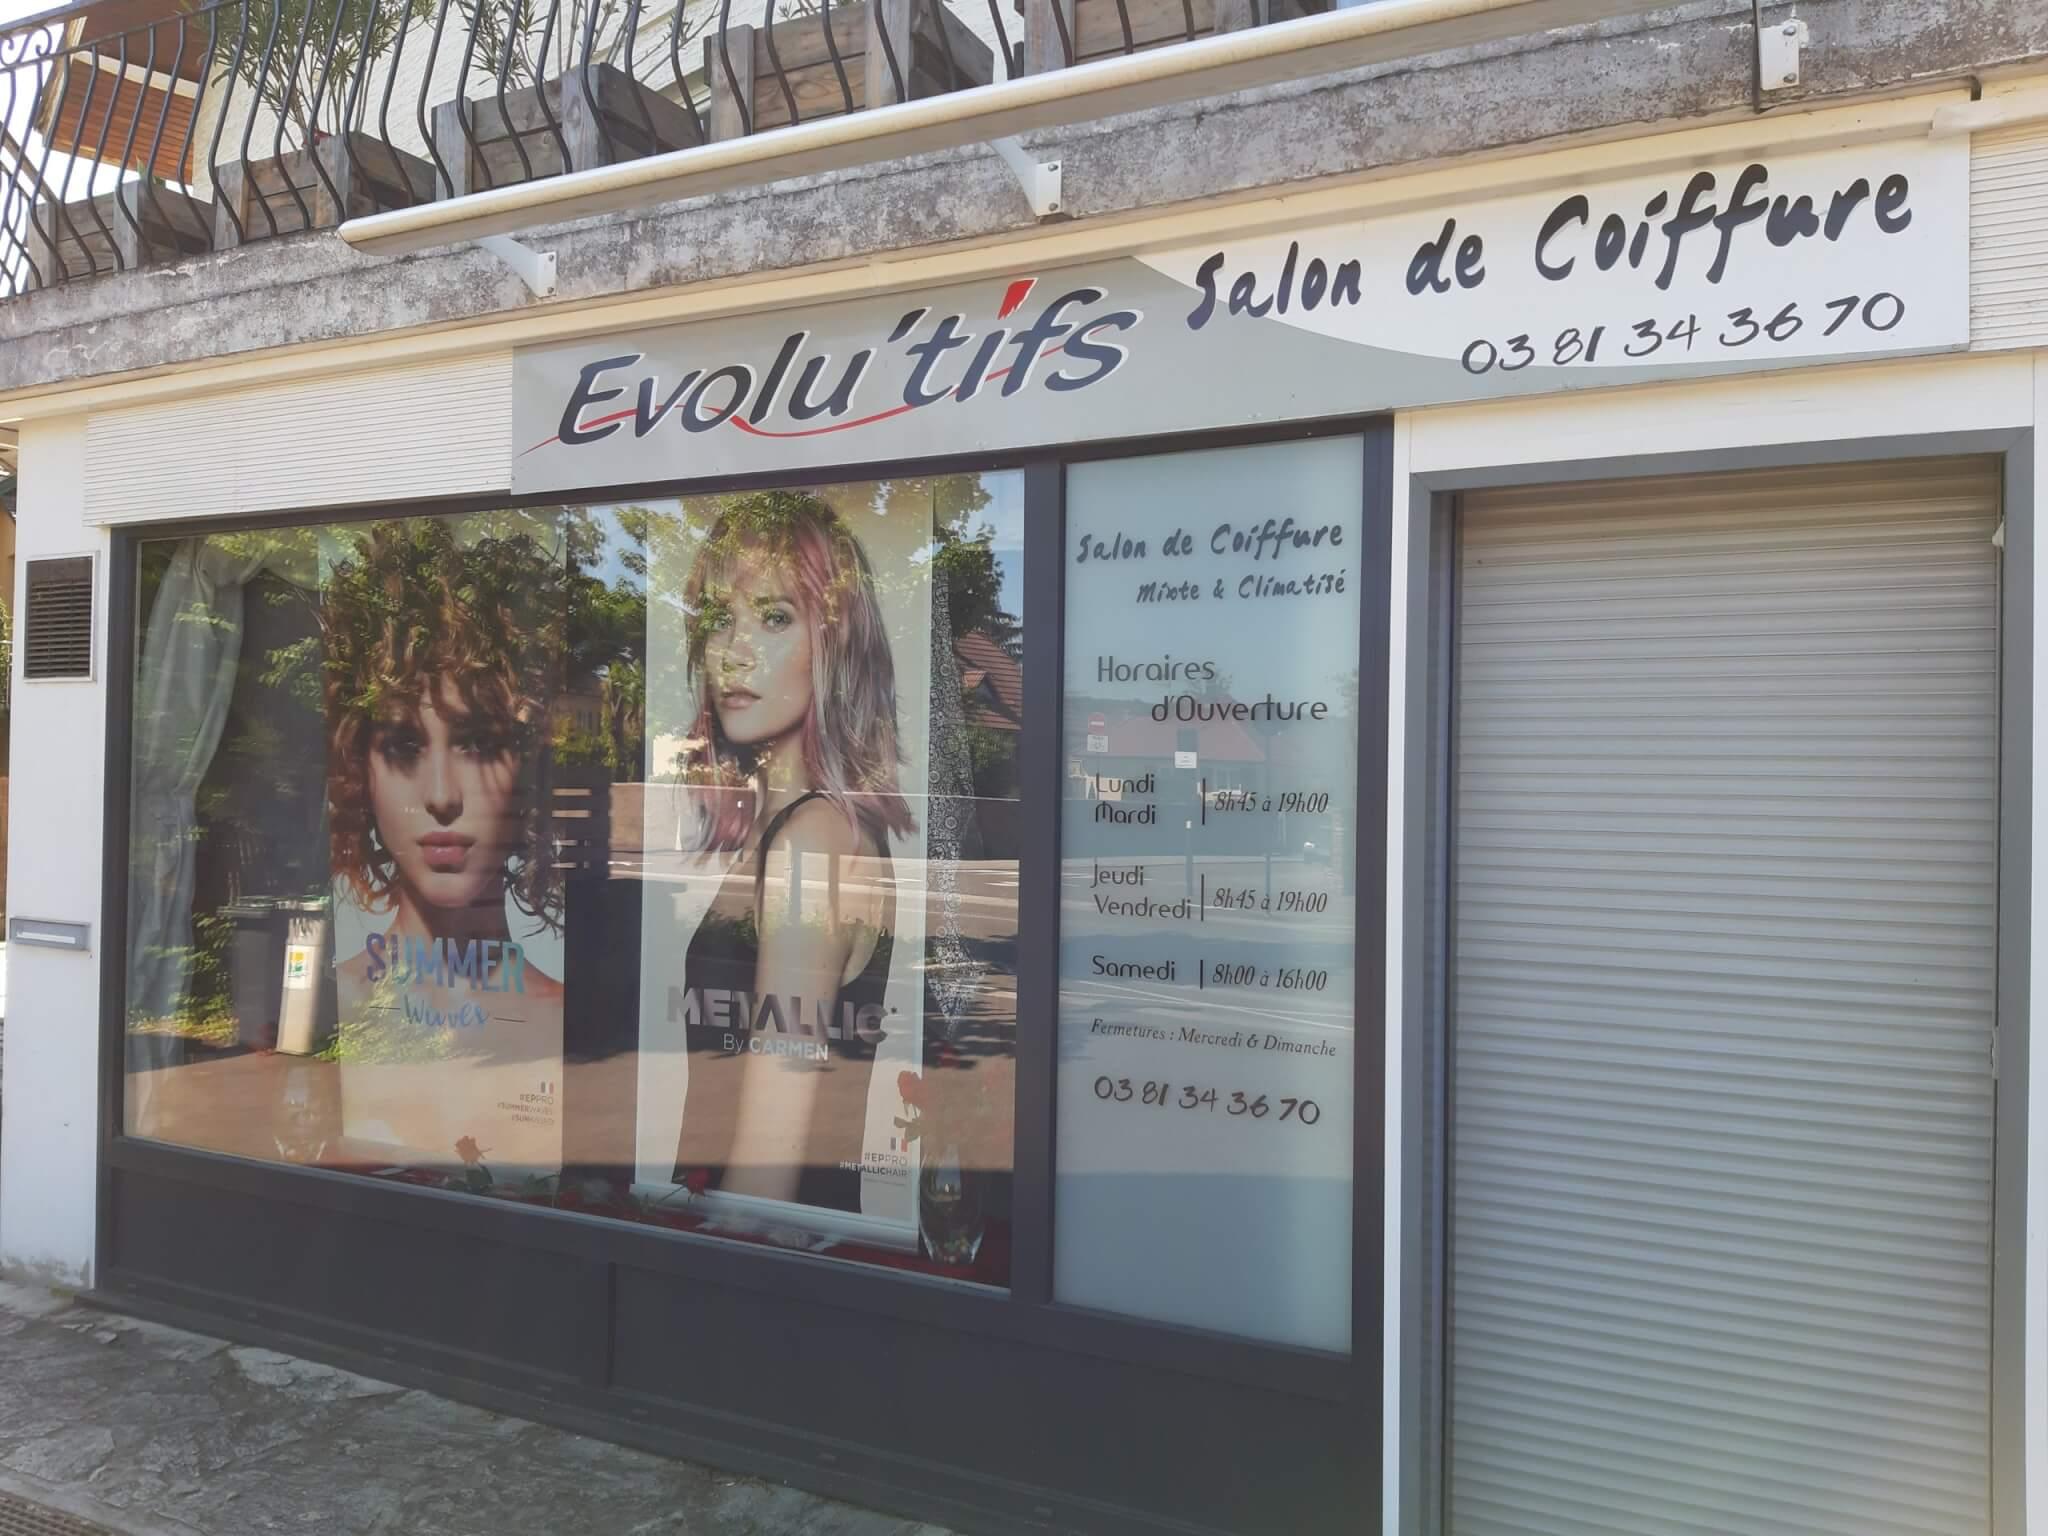 Evolu'tifs Jaidemescommercants.fr